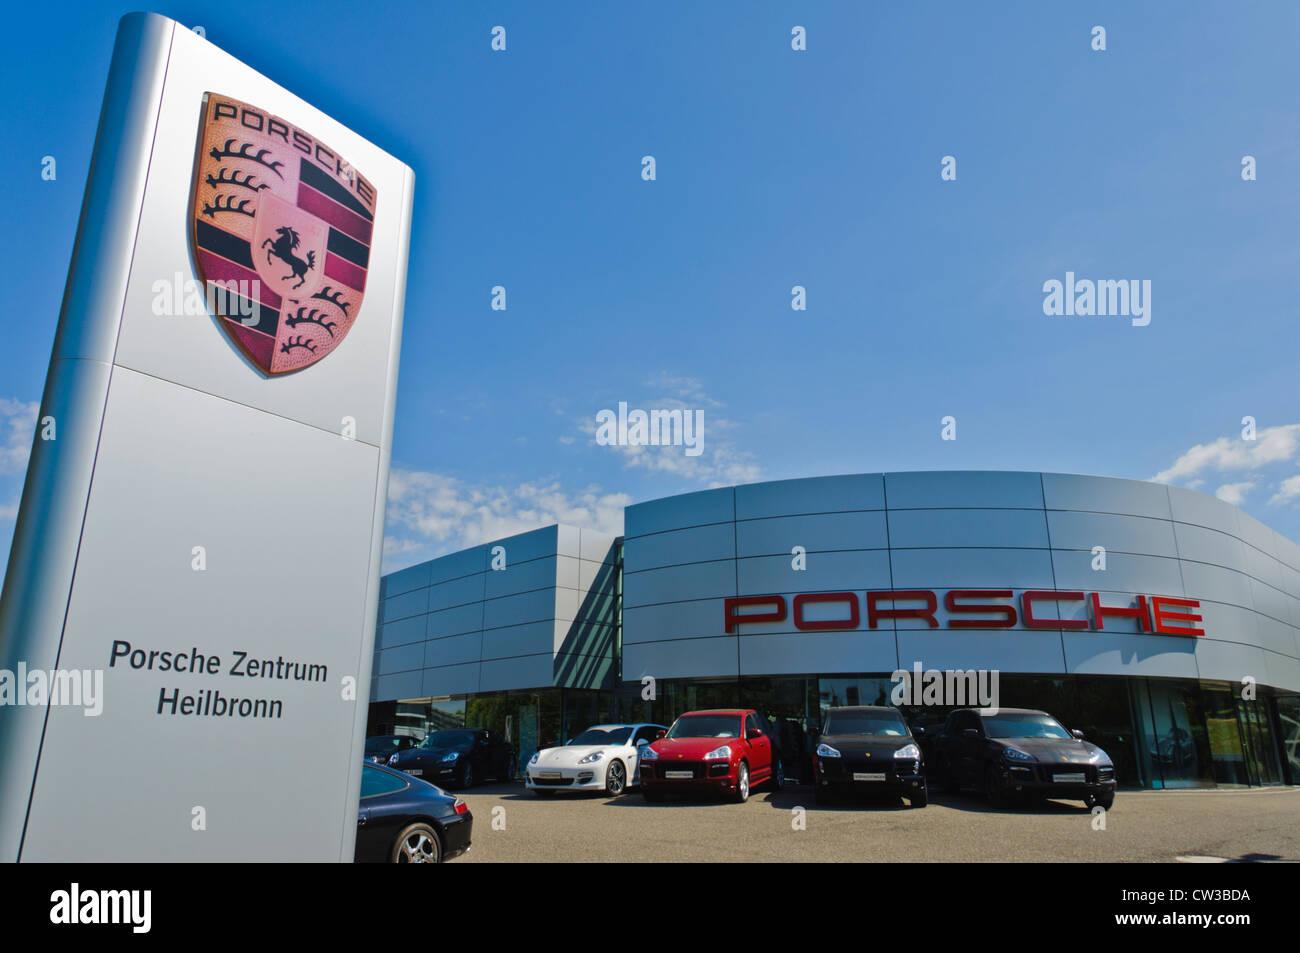 Porsche Zentrum Heilbronn company sign board with Porsche Logo in front of a modern Porsche luxury sports car dealership - Stock Image